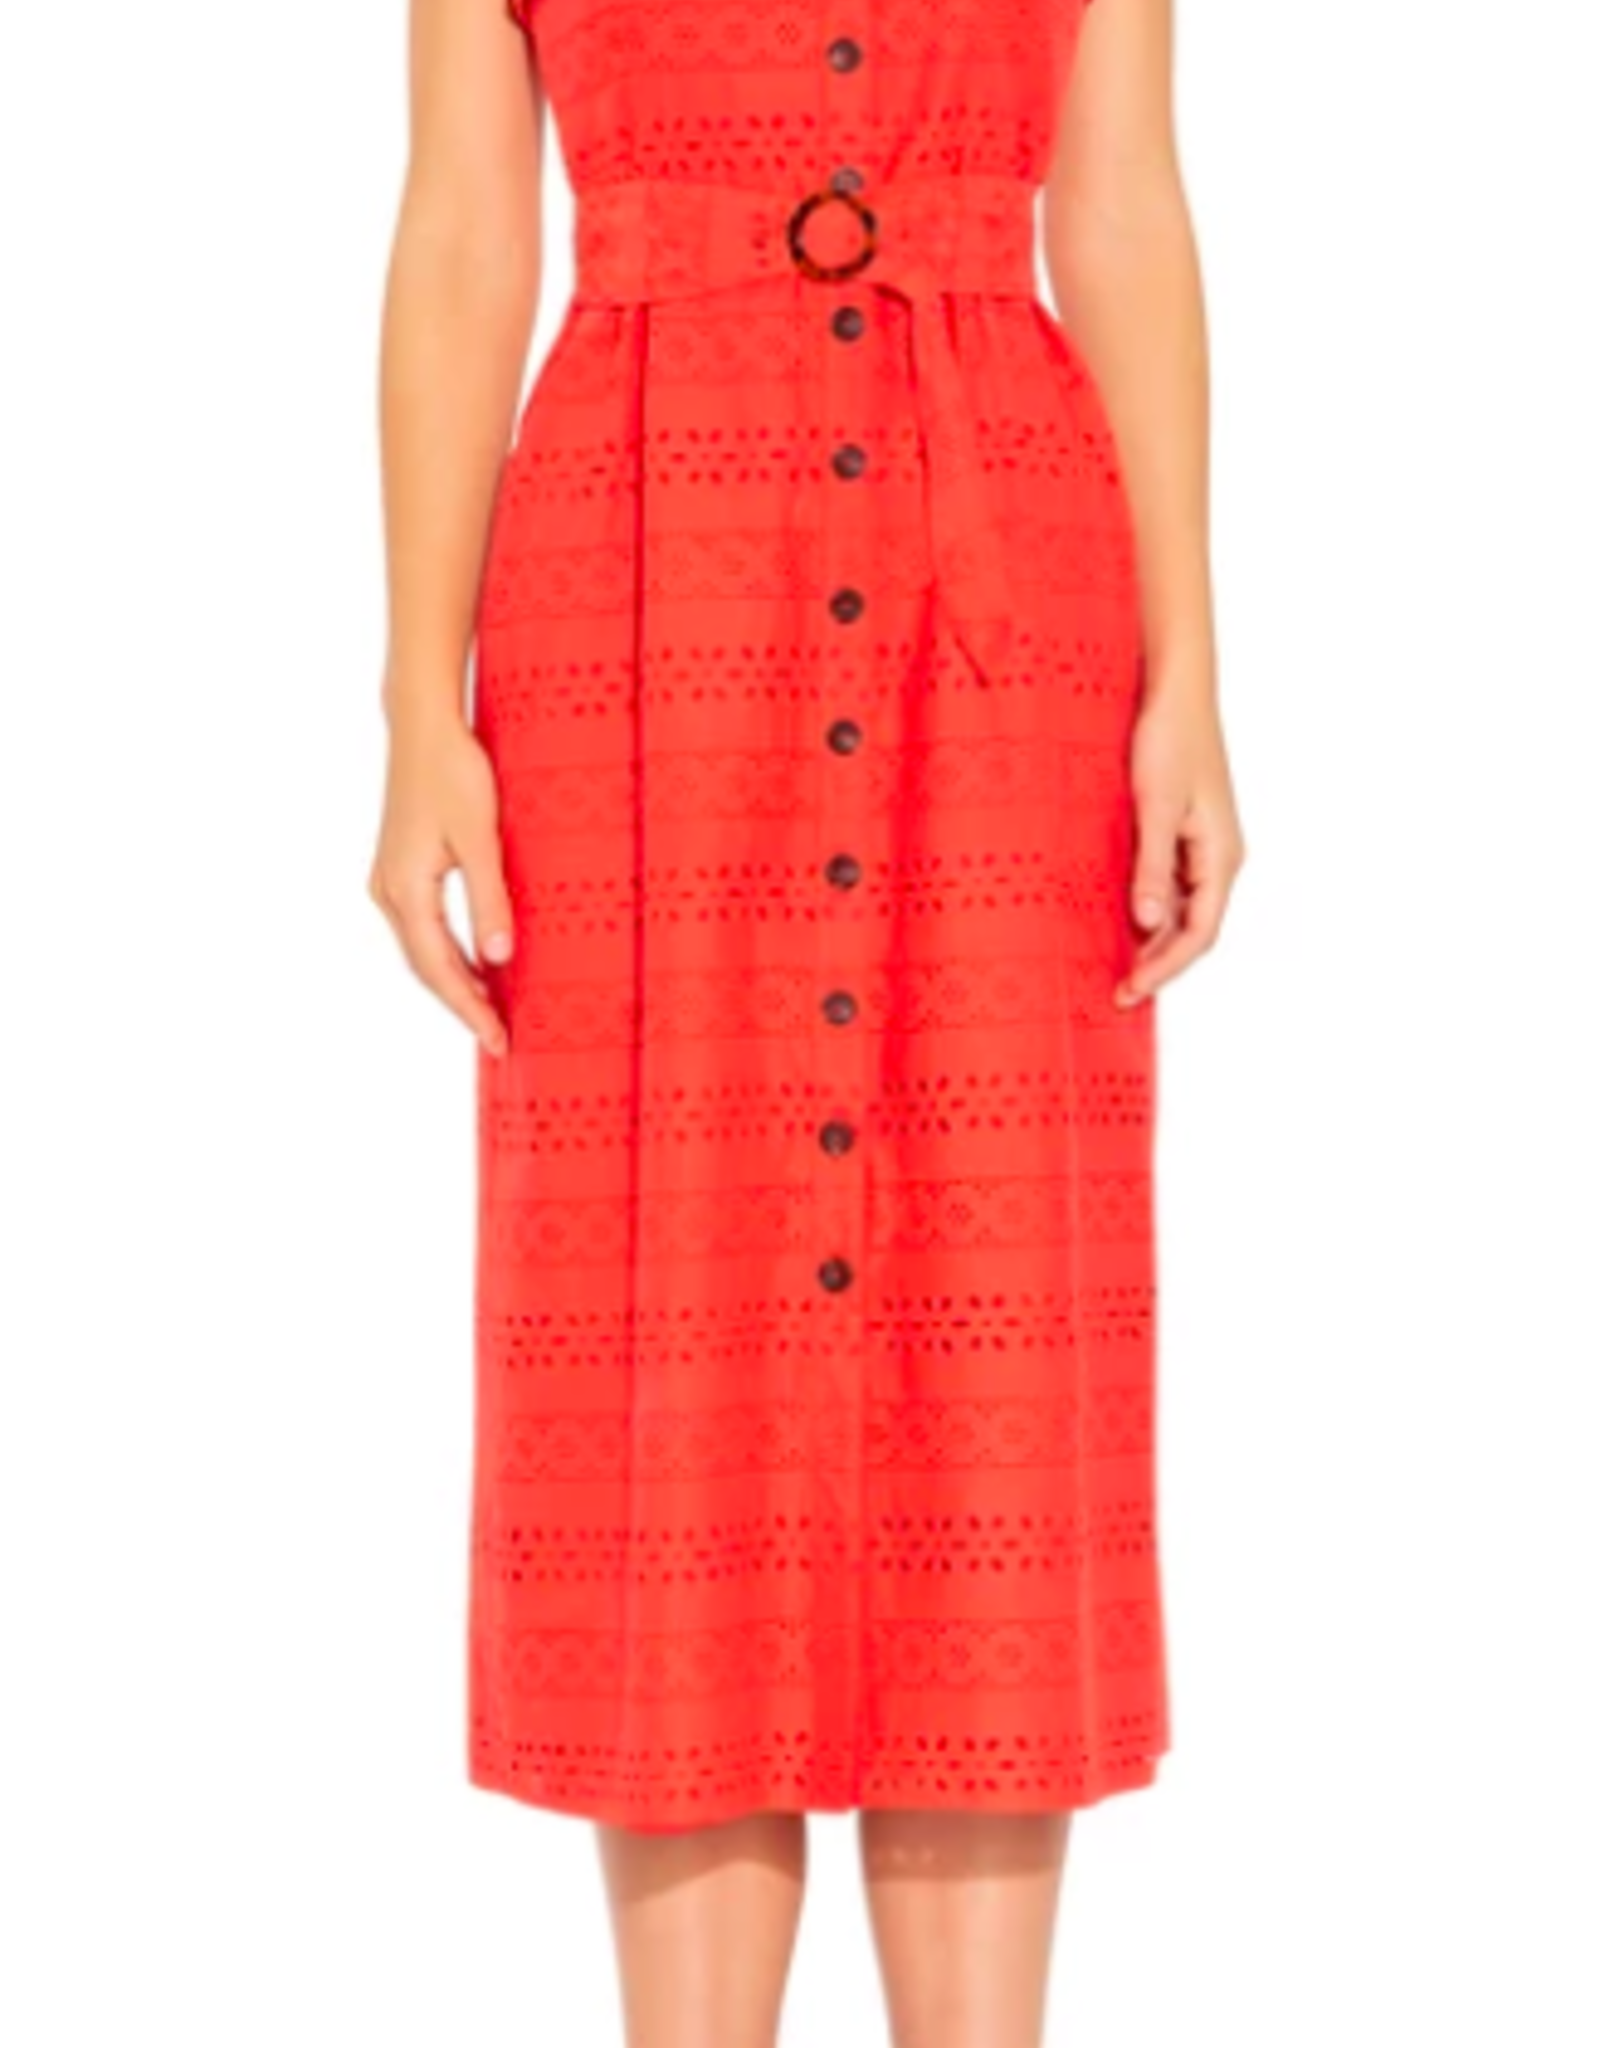 Shoshanna Albi Dress